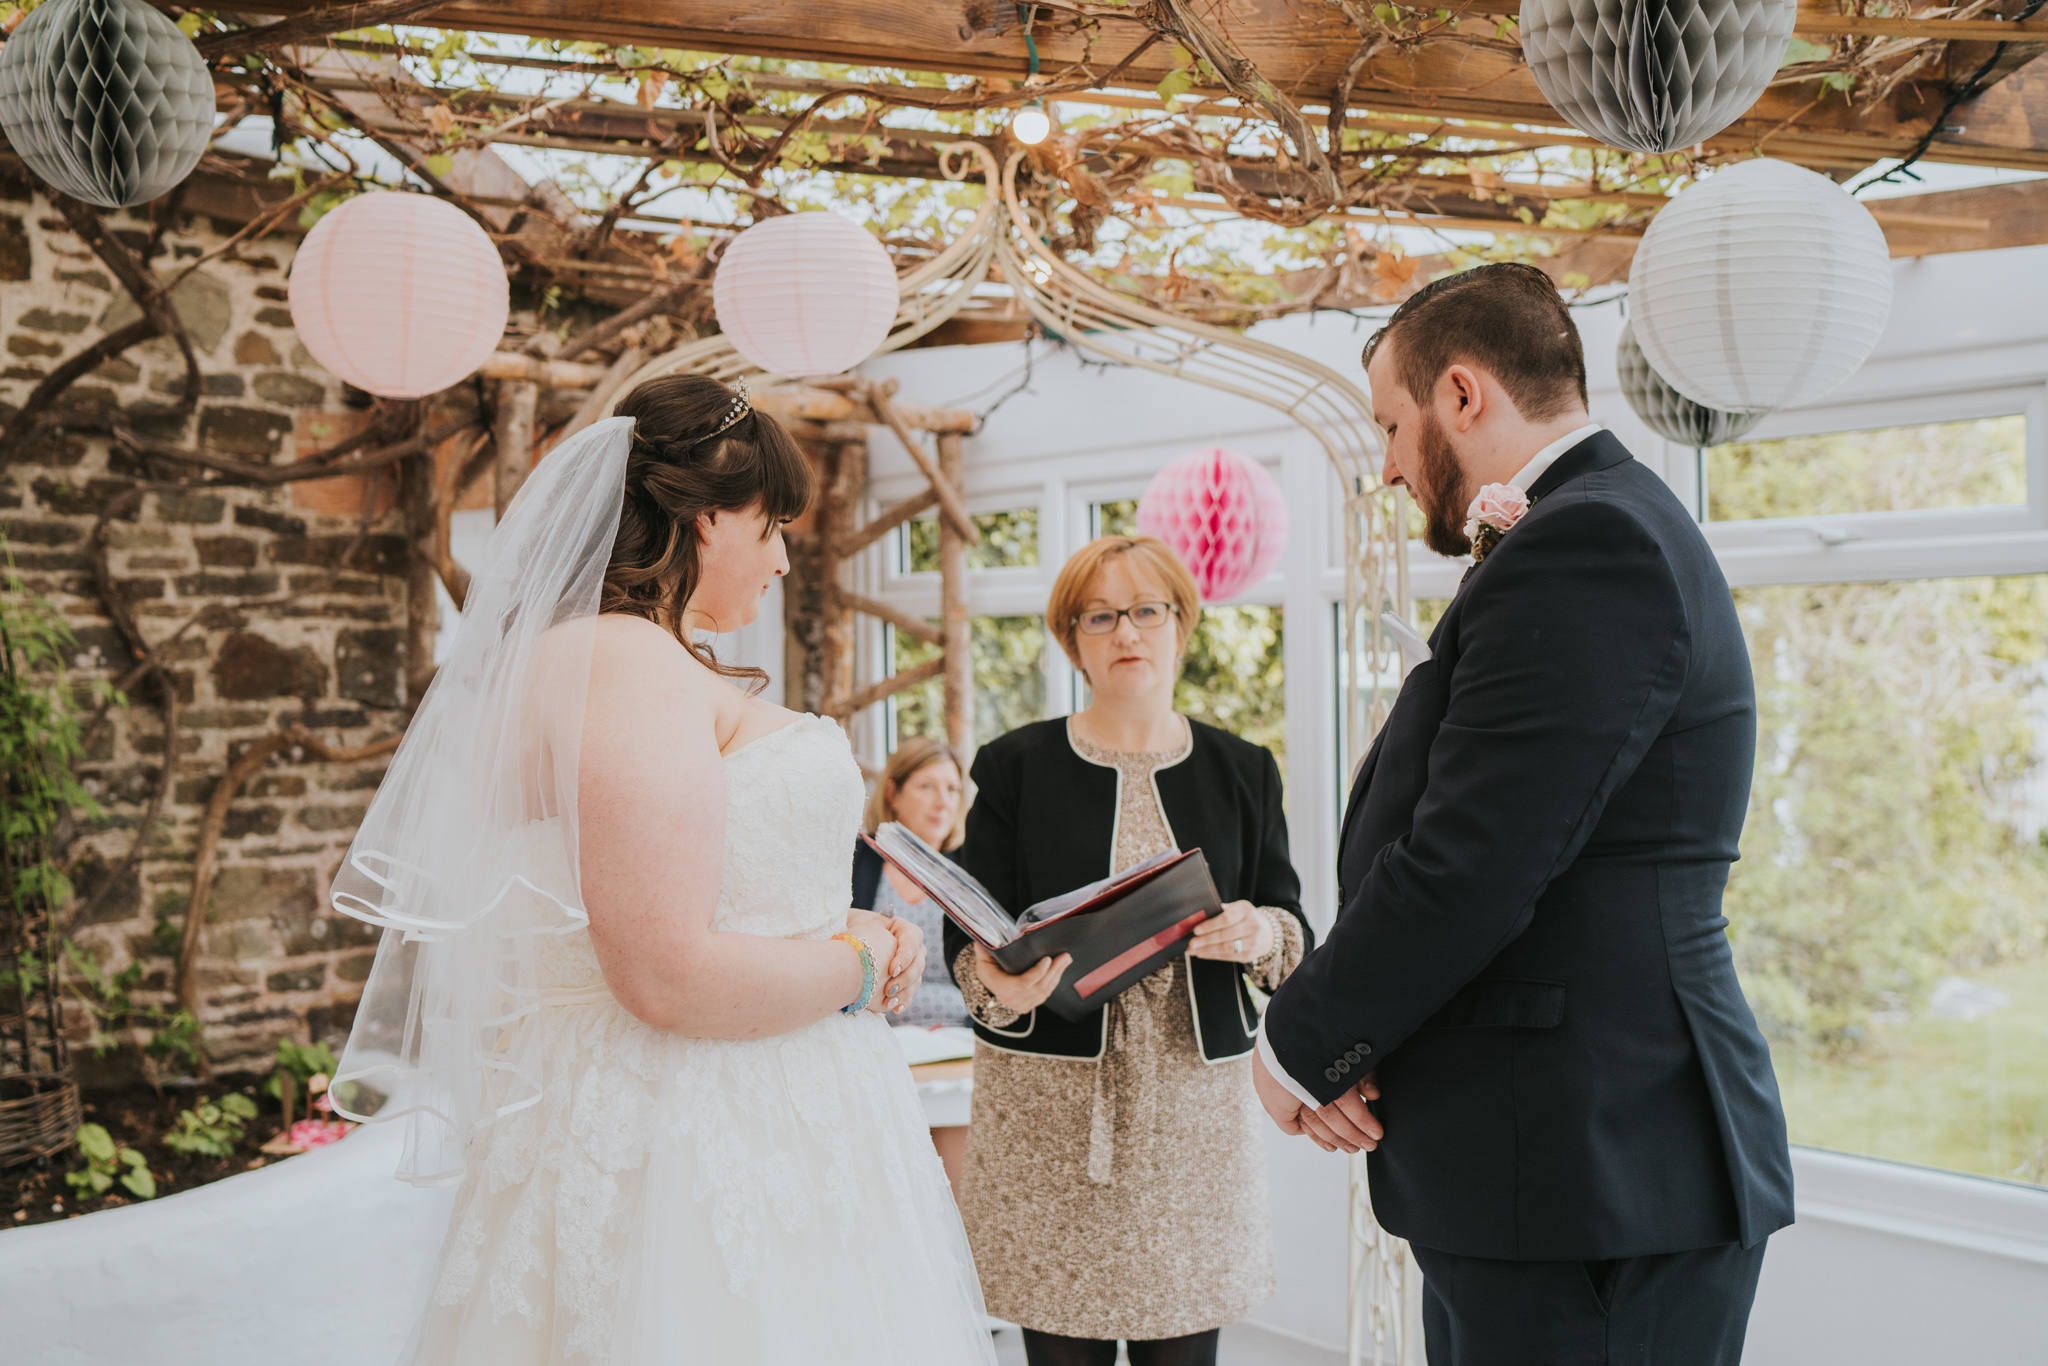 grace-sam-old-barn-clovelly-devon-wedding-photographer-grace-elizabeth-essex-suffolk-norfolk-wedding-photographer (49 of 132).jpg